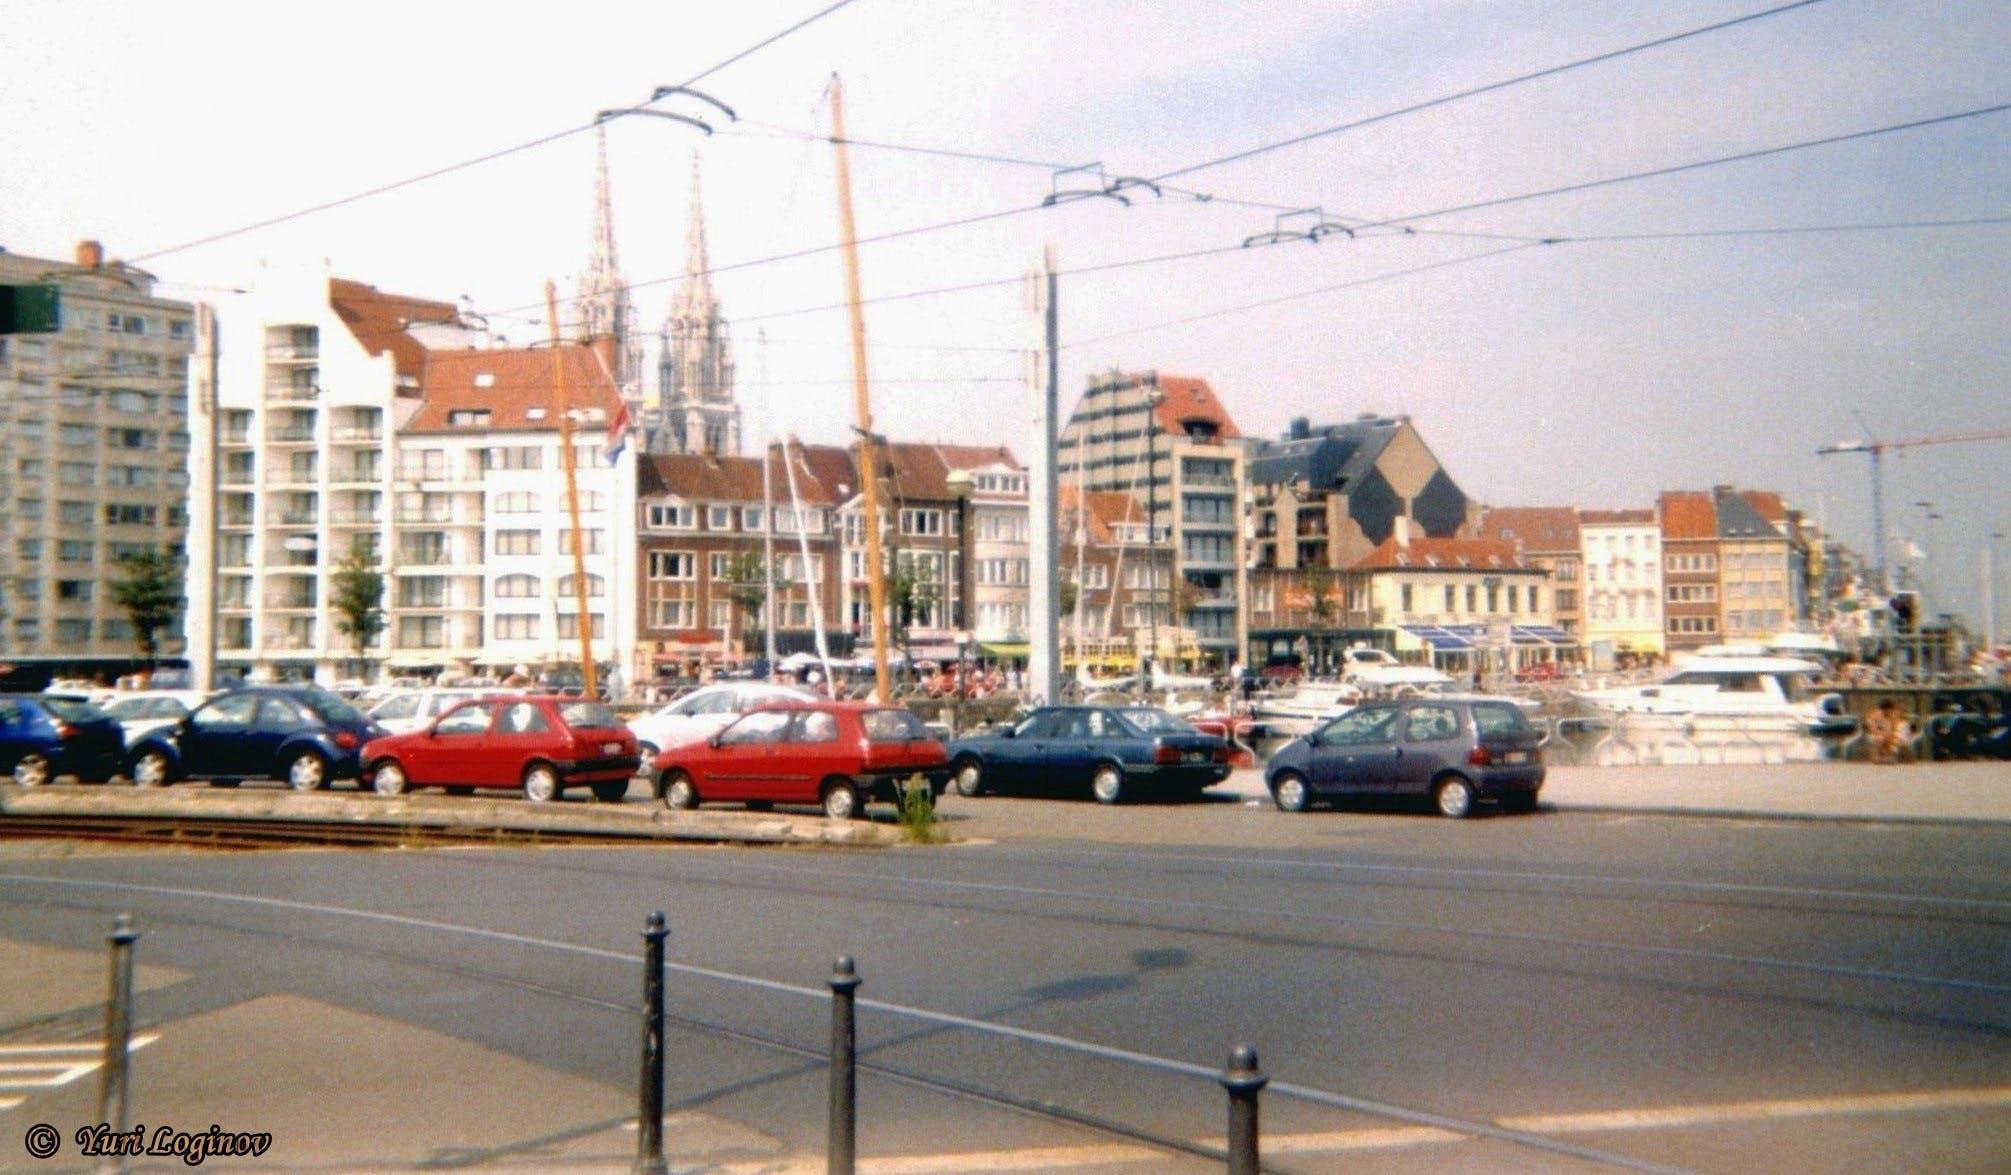 Free stock photo of Belgium, Oostende, België, Ostend